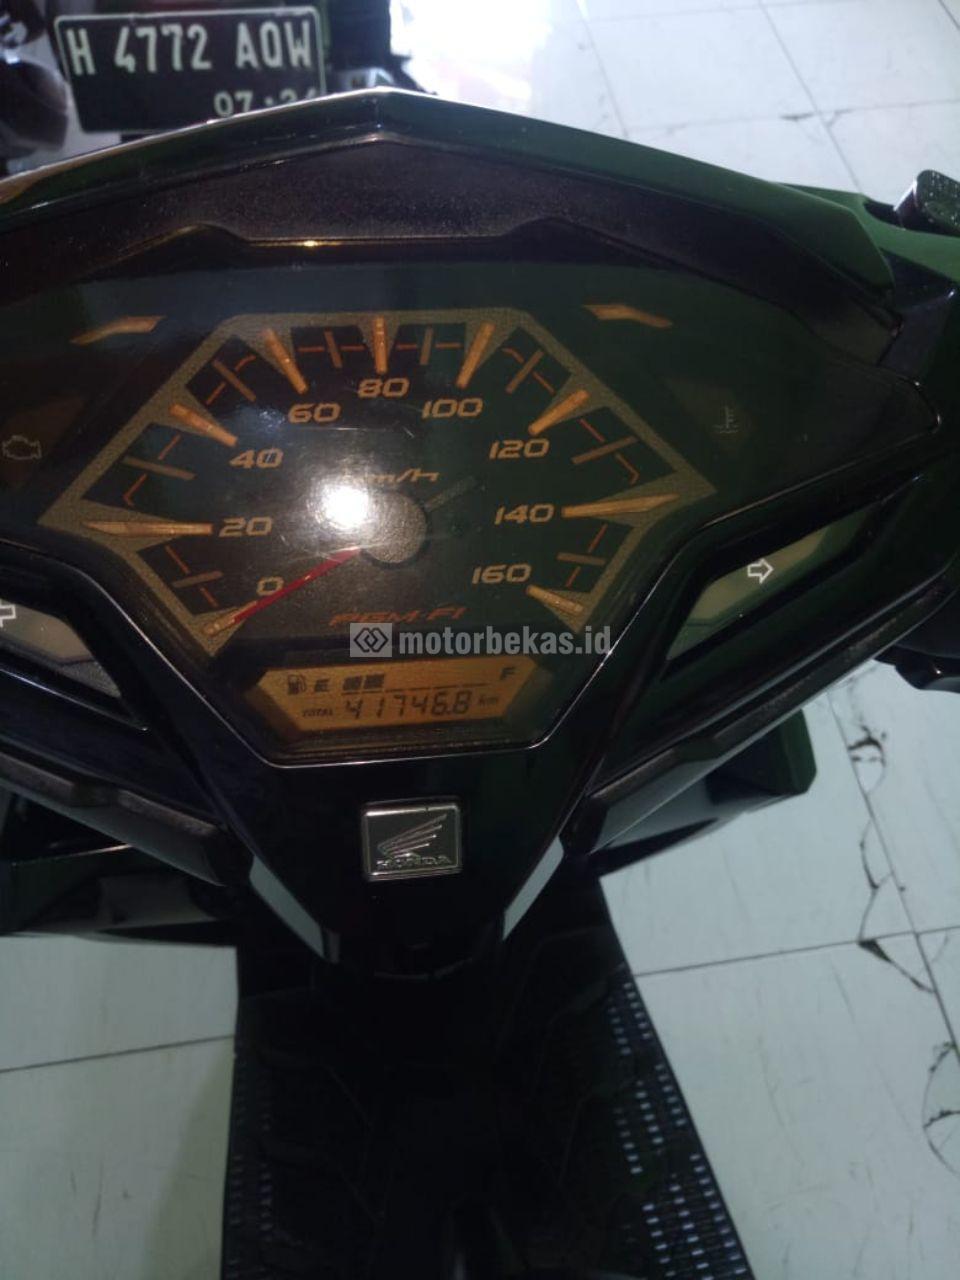 HONDA VARIO TECHNO 125  2533 motorbekas.id